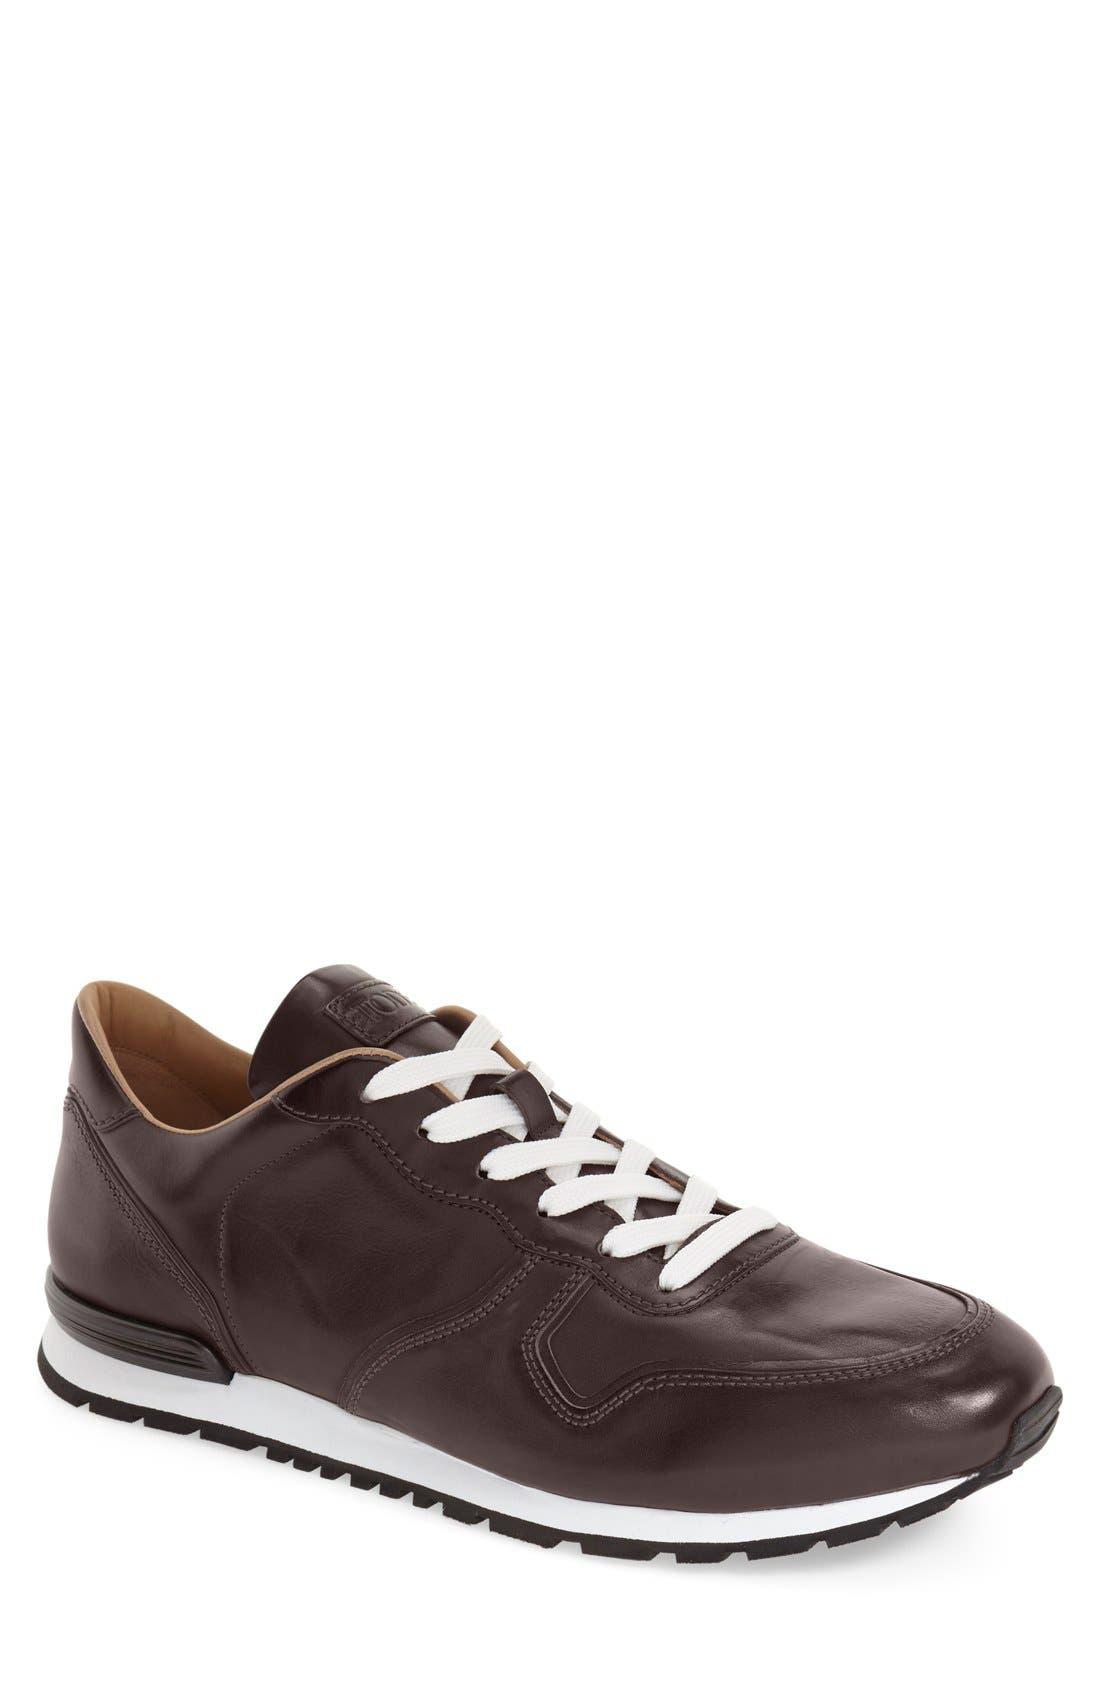 Main Image - Tod's 'Allacciato' Sneaker (Men)